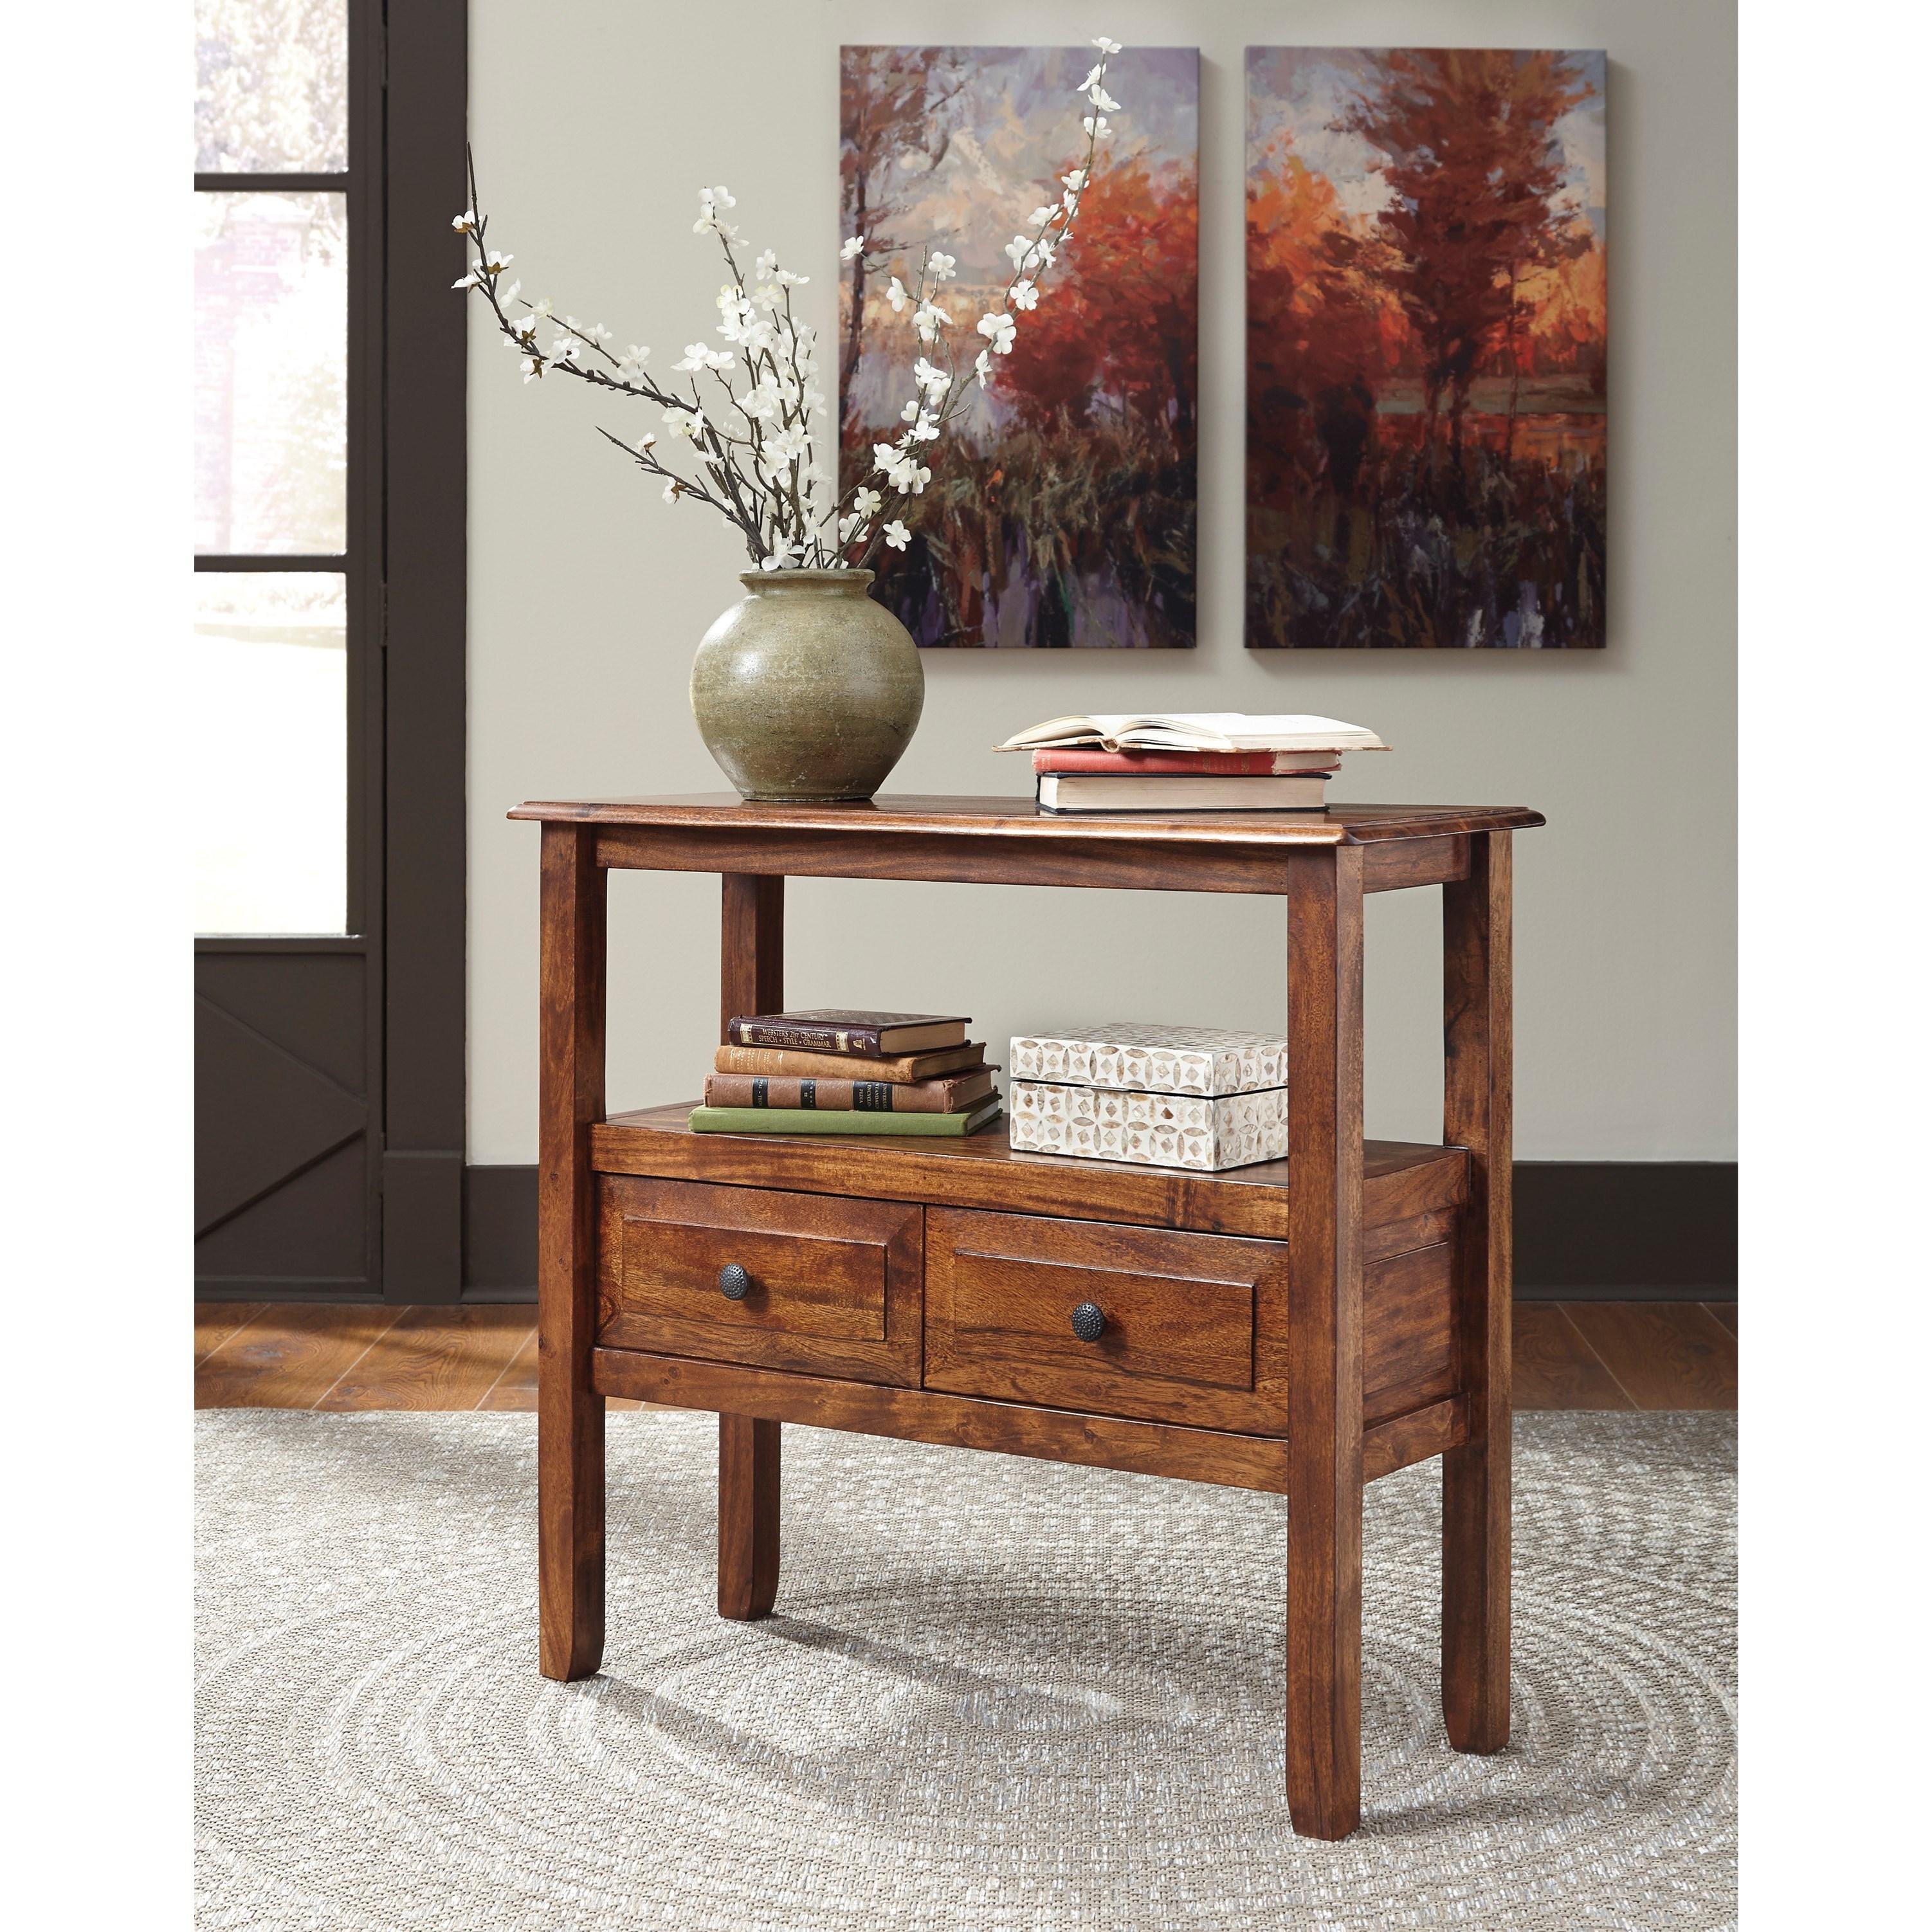 Ashley Furniture Bloomington Illinois Photos Reviews: Signature Design By Ashley Abbonto Acacia Solid Wood